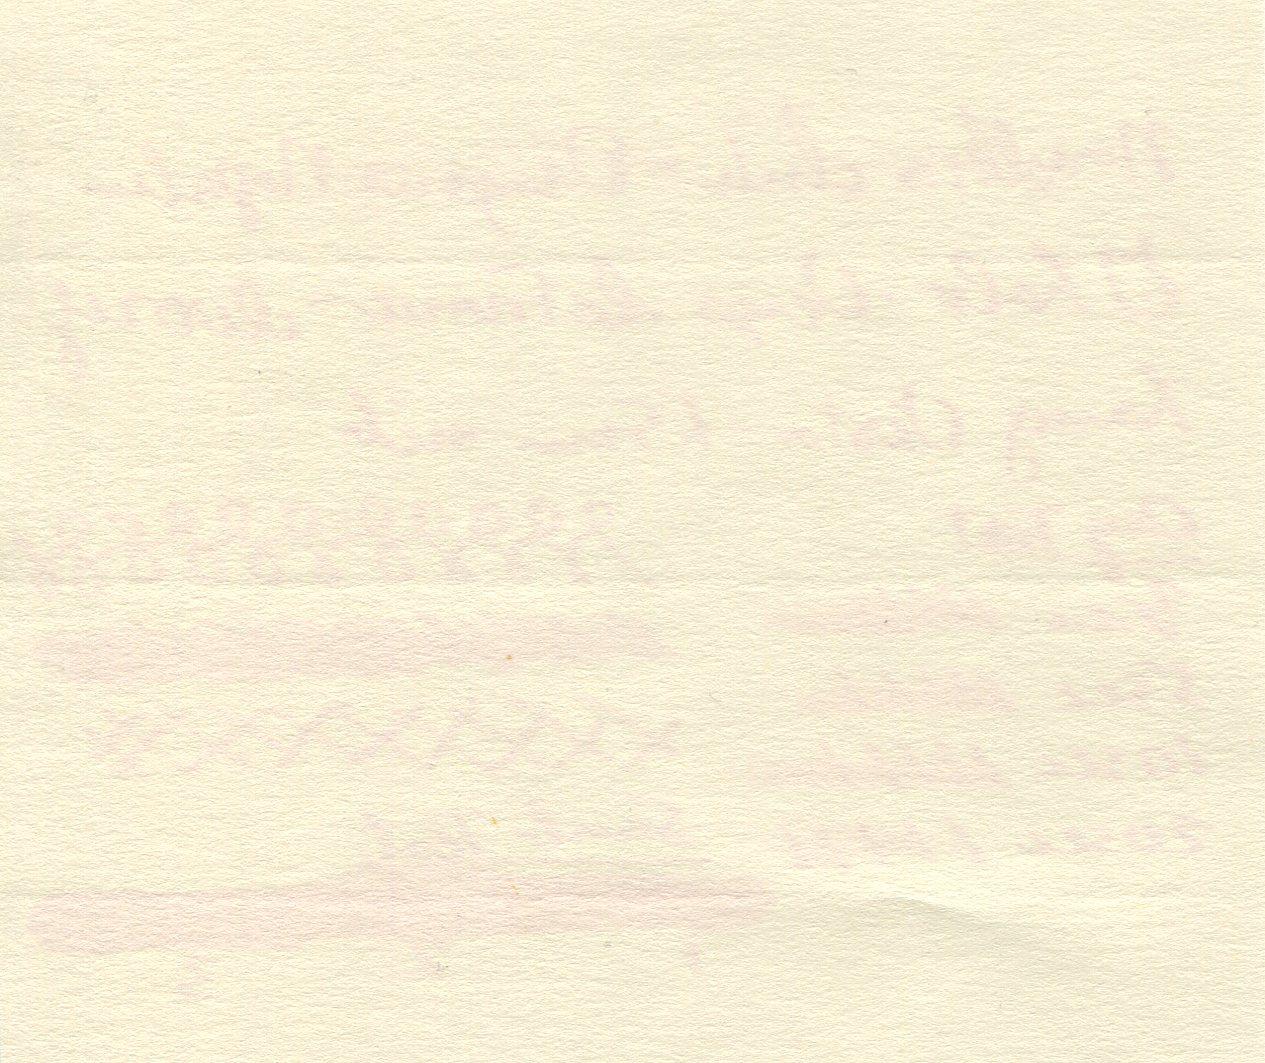 Noodlers-Dragons-Napalm-Glalo-Ivory-Back-068